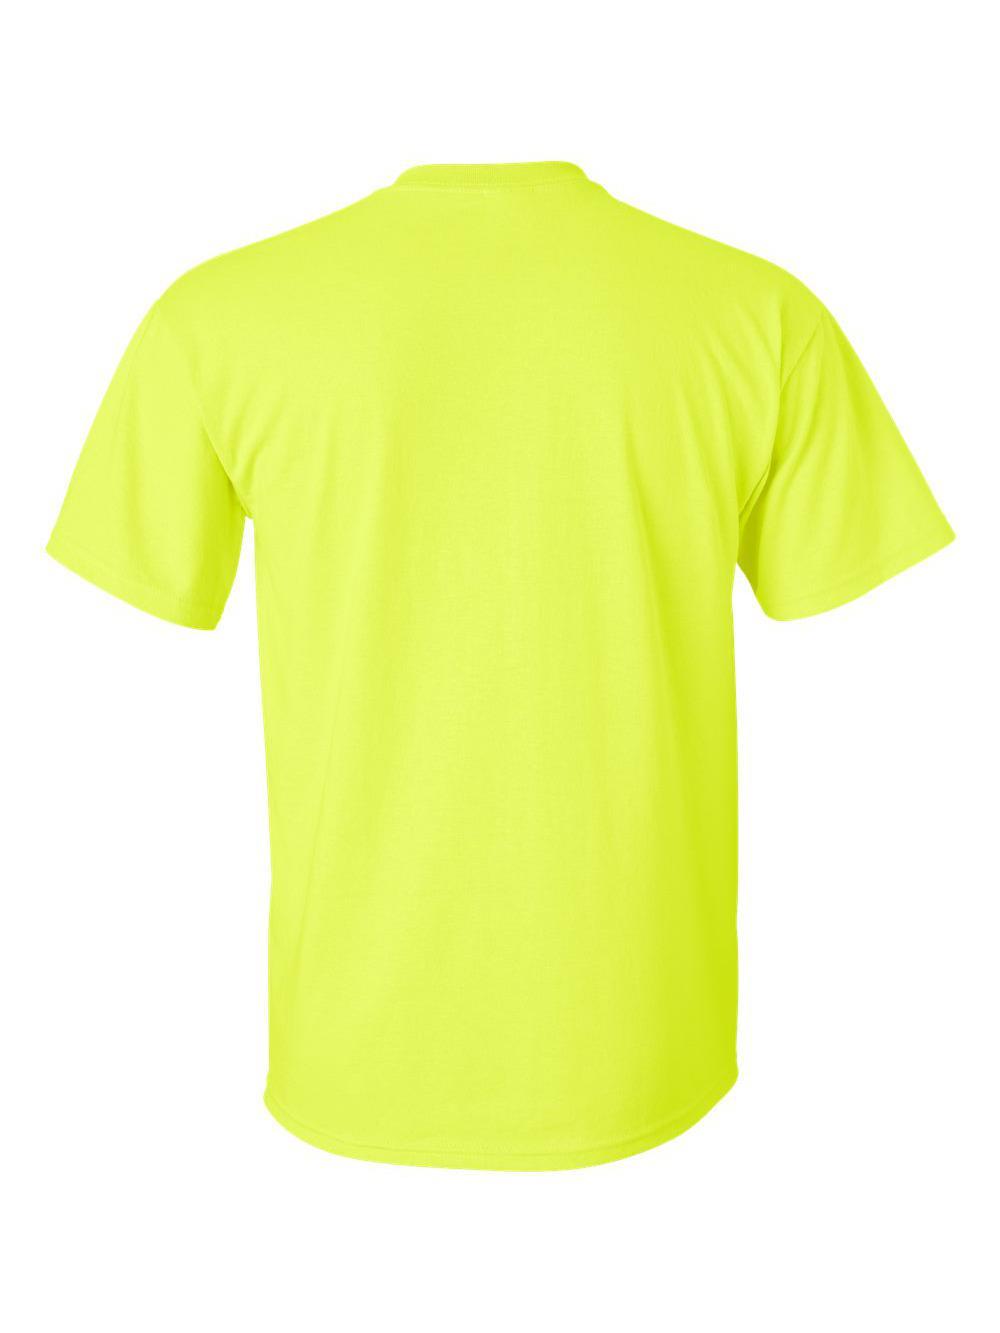 Gildan-Ultra-Cotton-T-Shirt-Tall-Sizes-2000T thumbnail 19